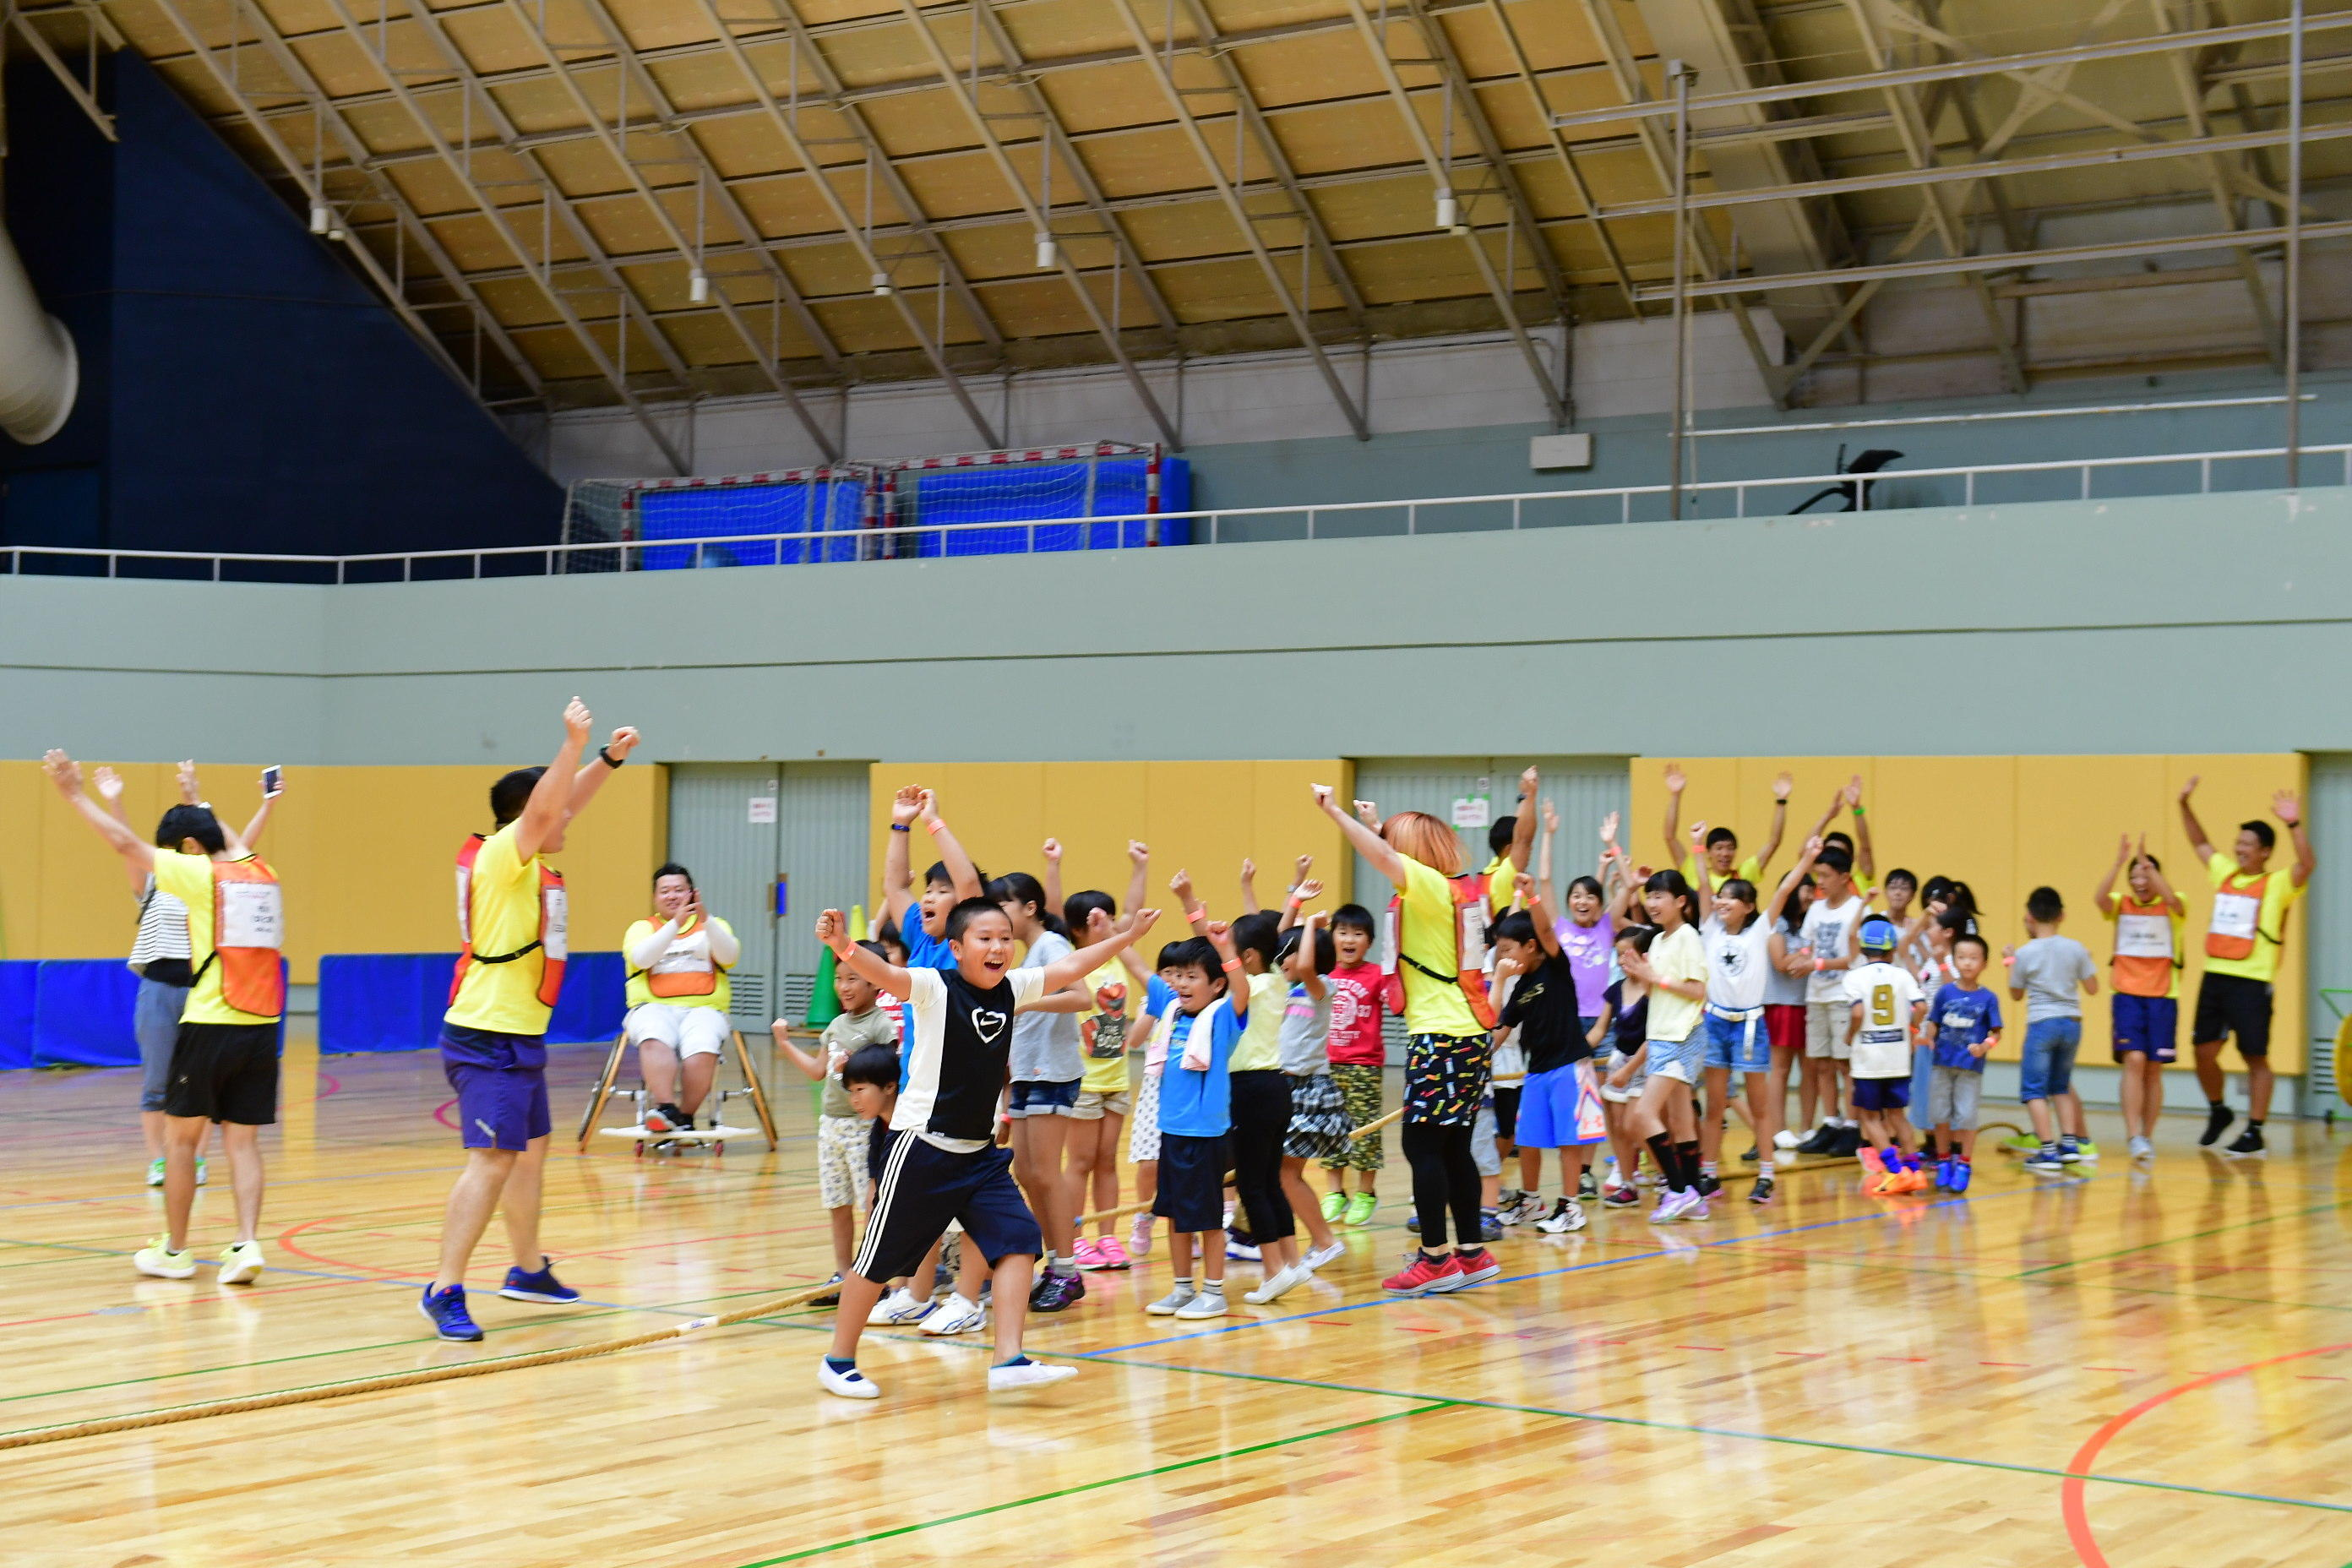 http://news.yoshimoto.co.jp/20181008193053-9aeee4137b126e5ae132c88175fa661abcabf5a0.jpg